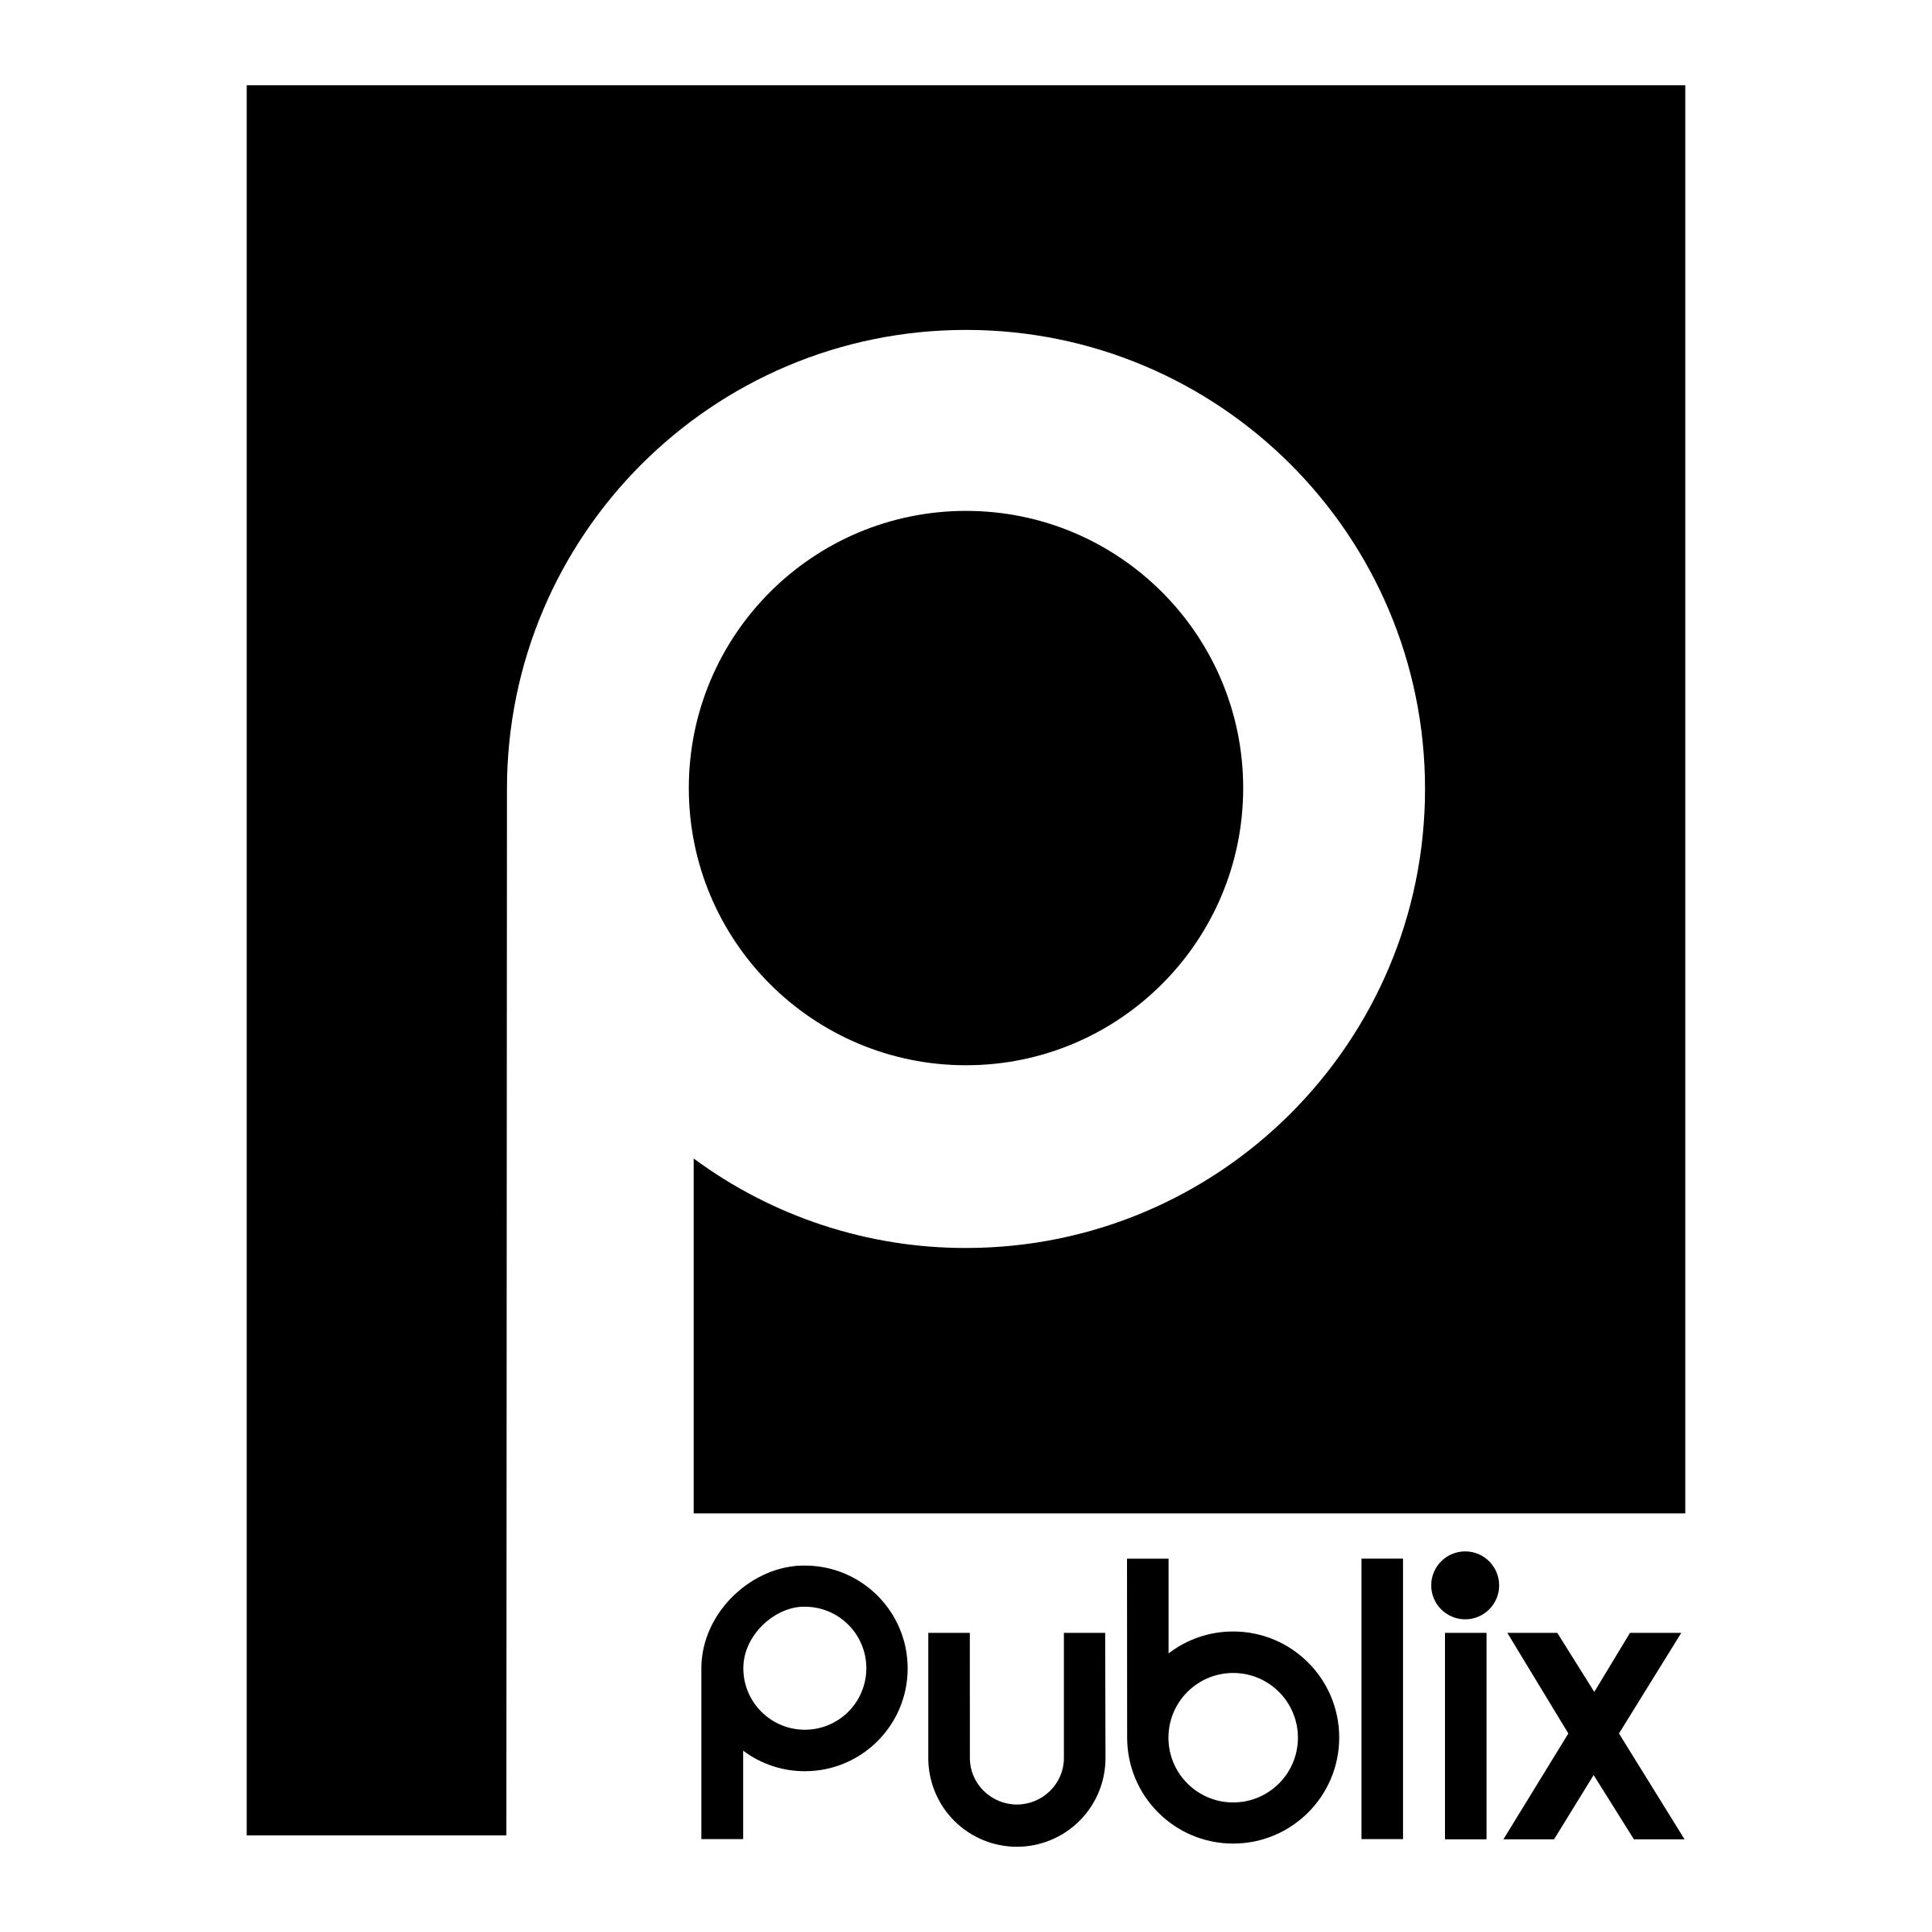 publix-logo-png-transparent.png